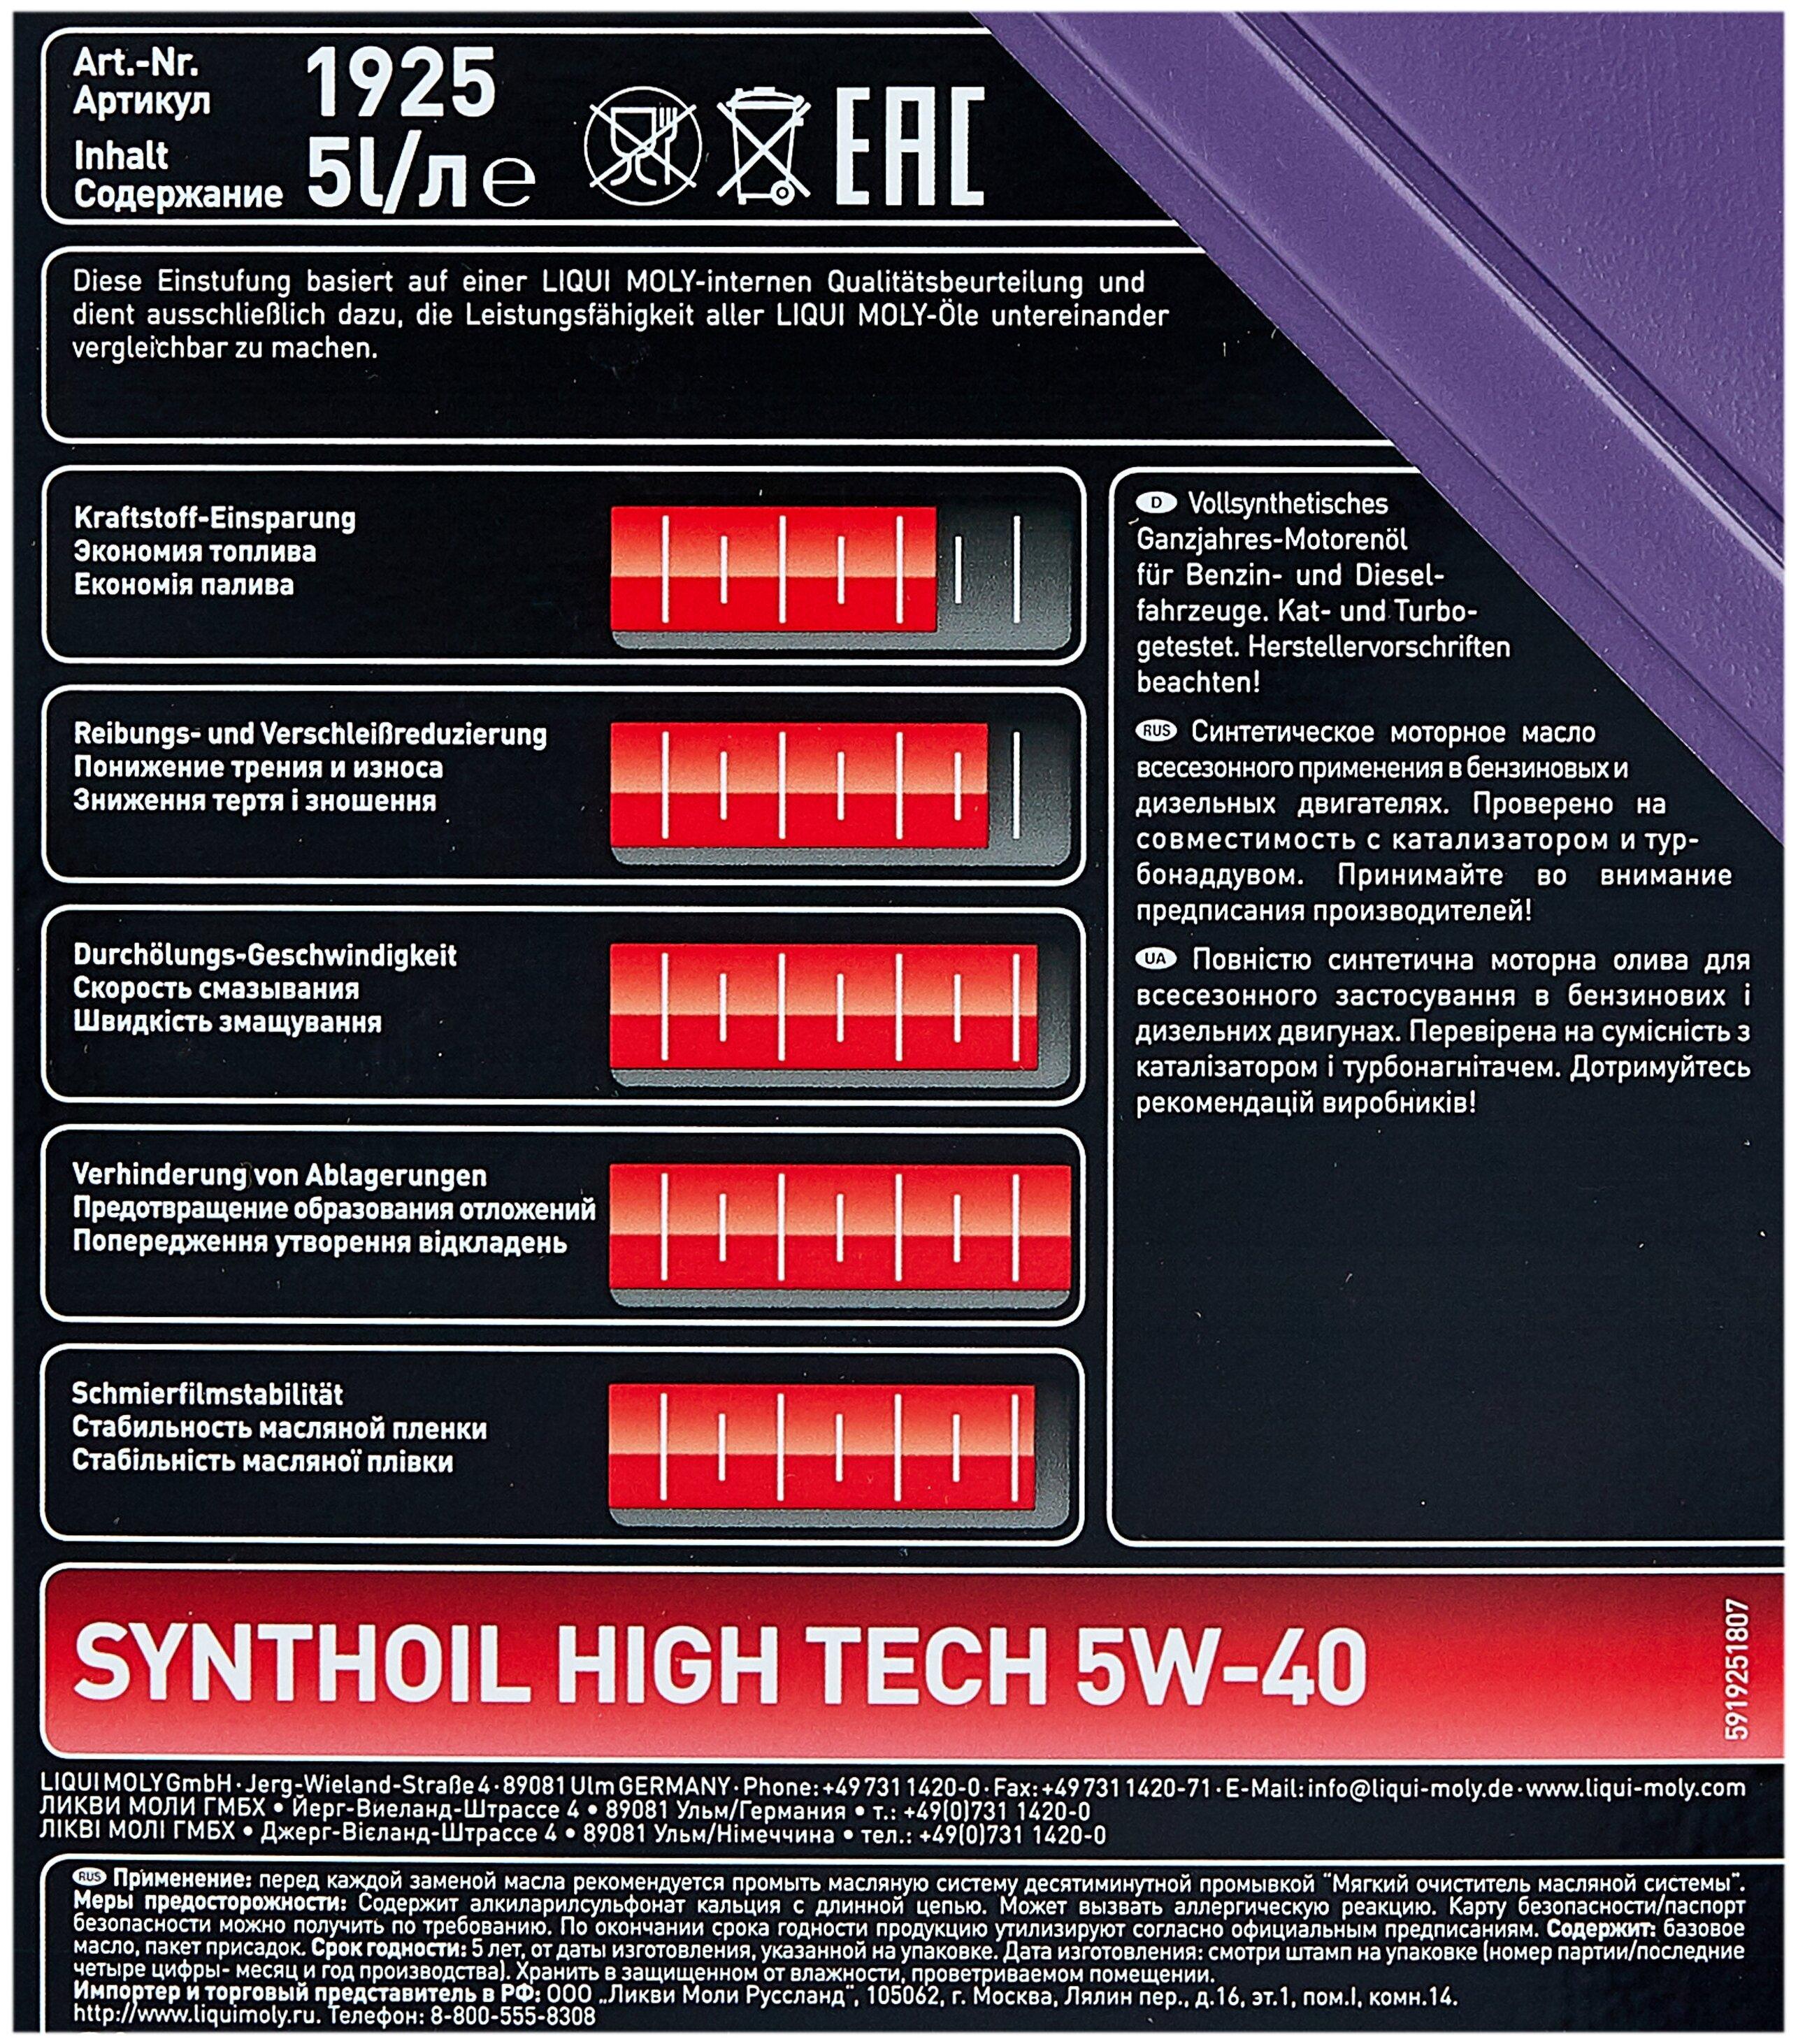 Liqui Moly Synthoil High Tech SAE 5W-40